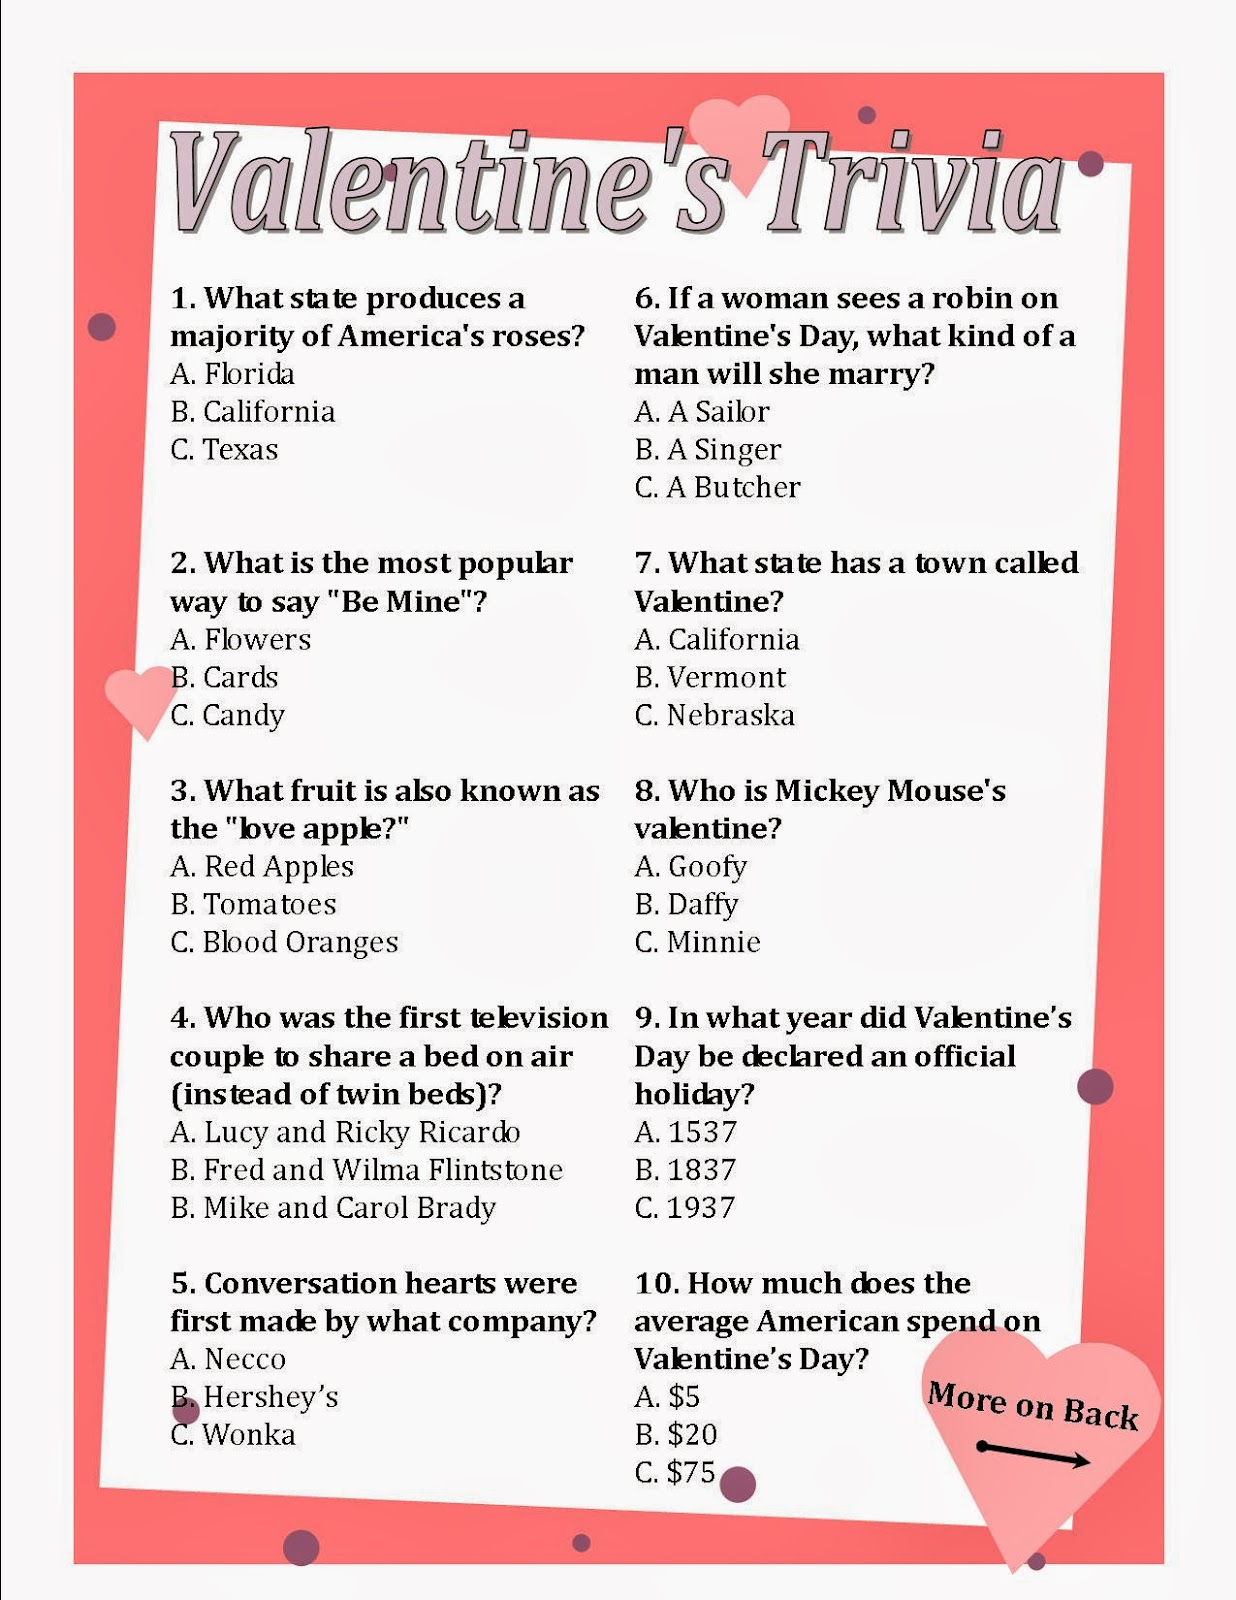 villa serena retirement community: valentine's day presents, Ideas